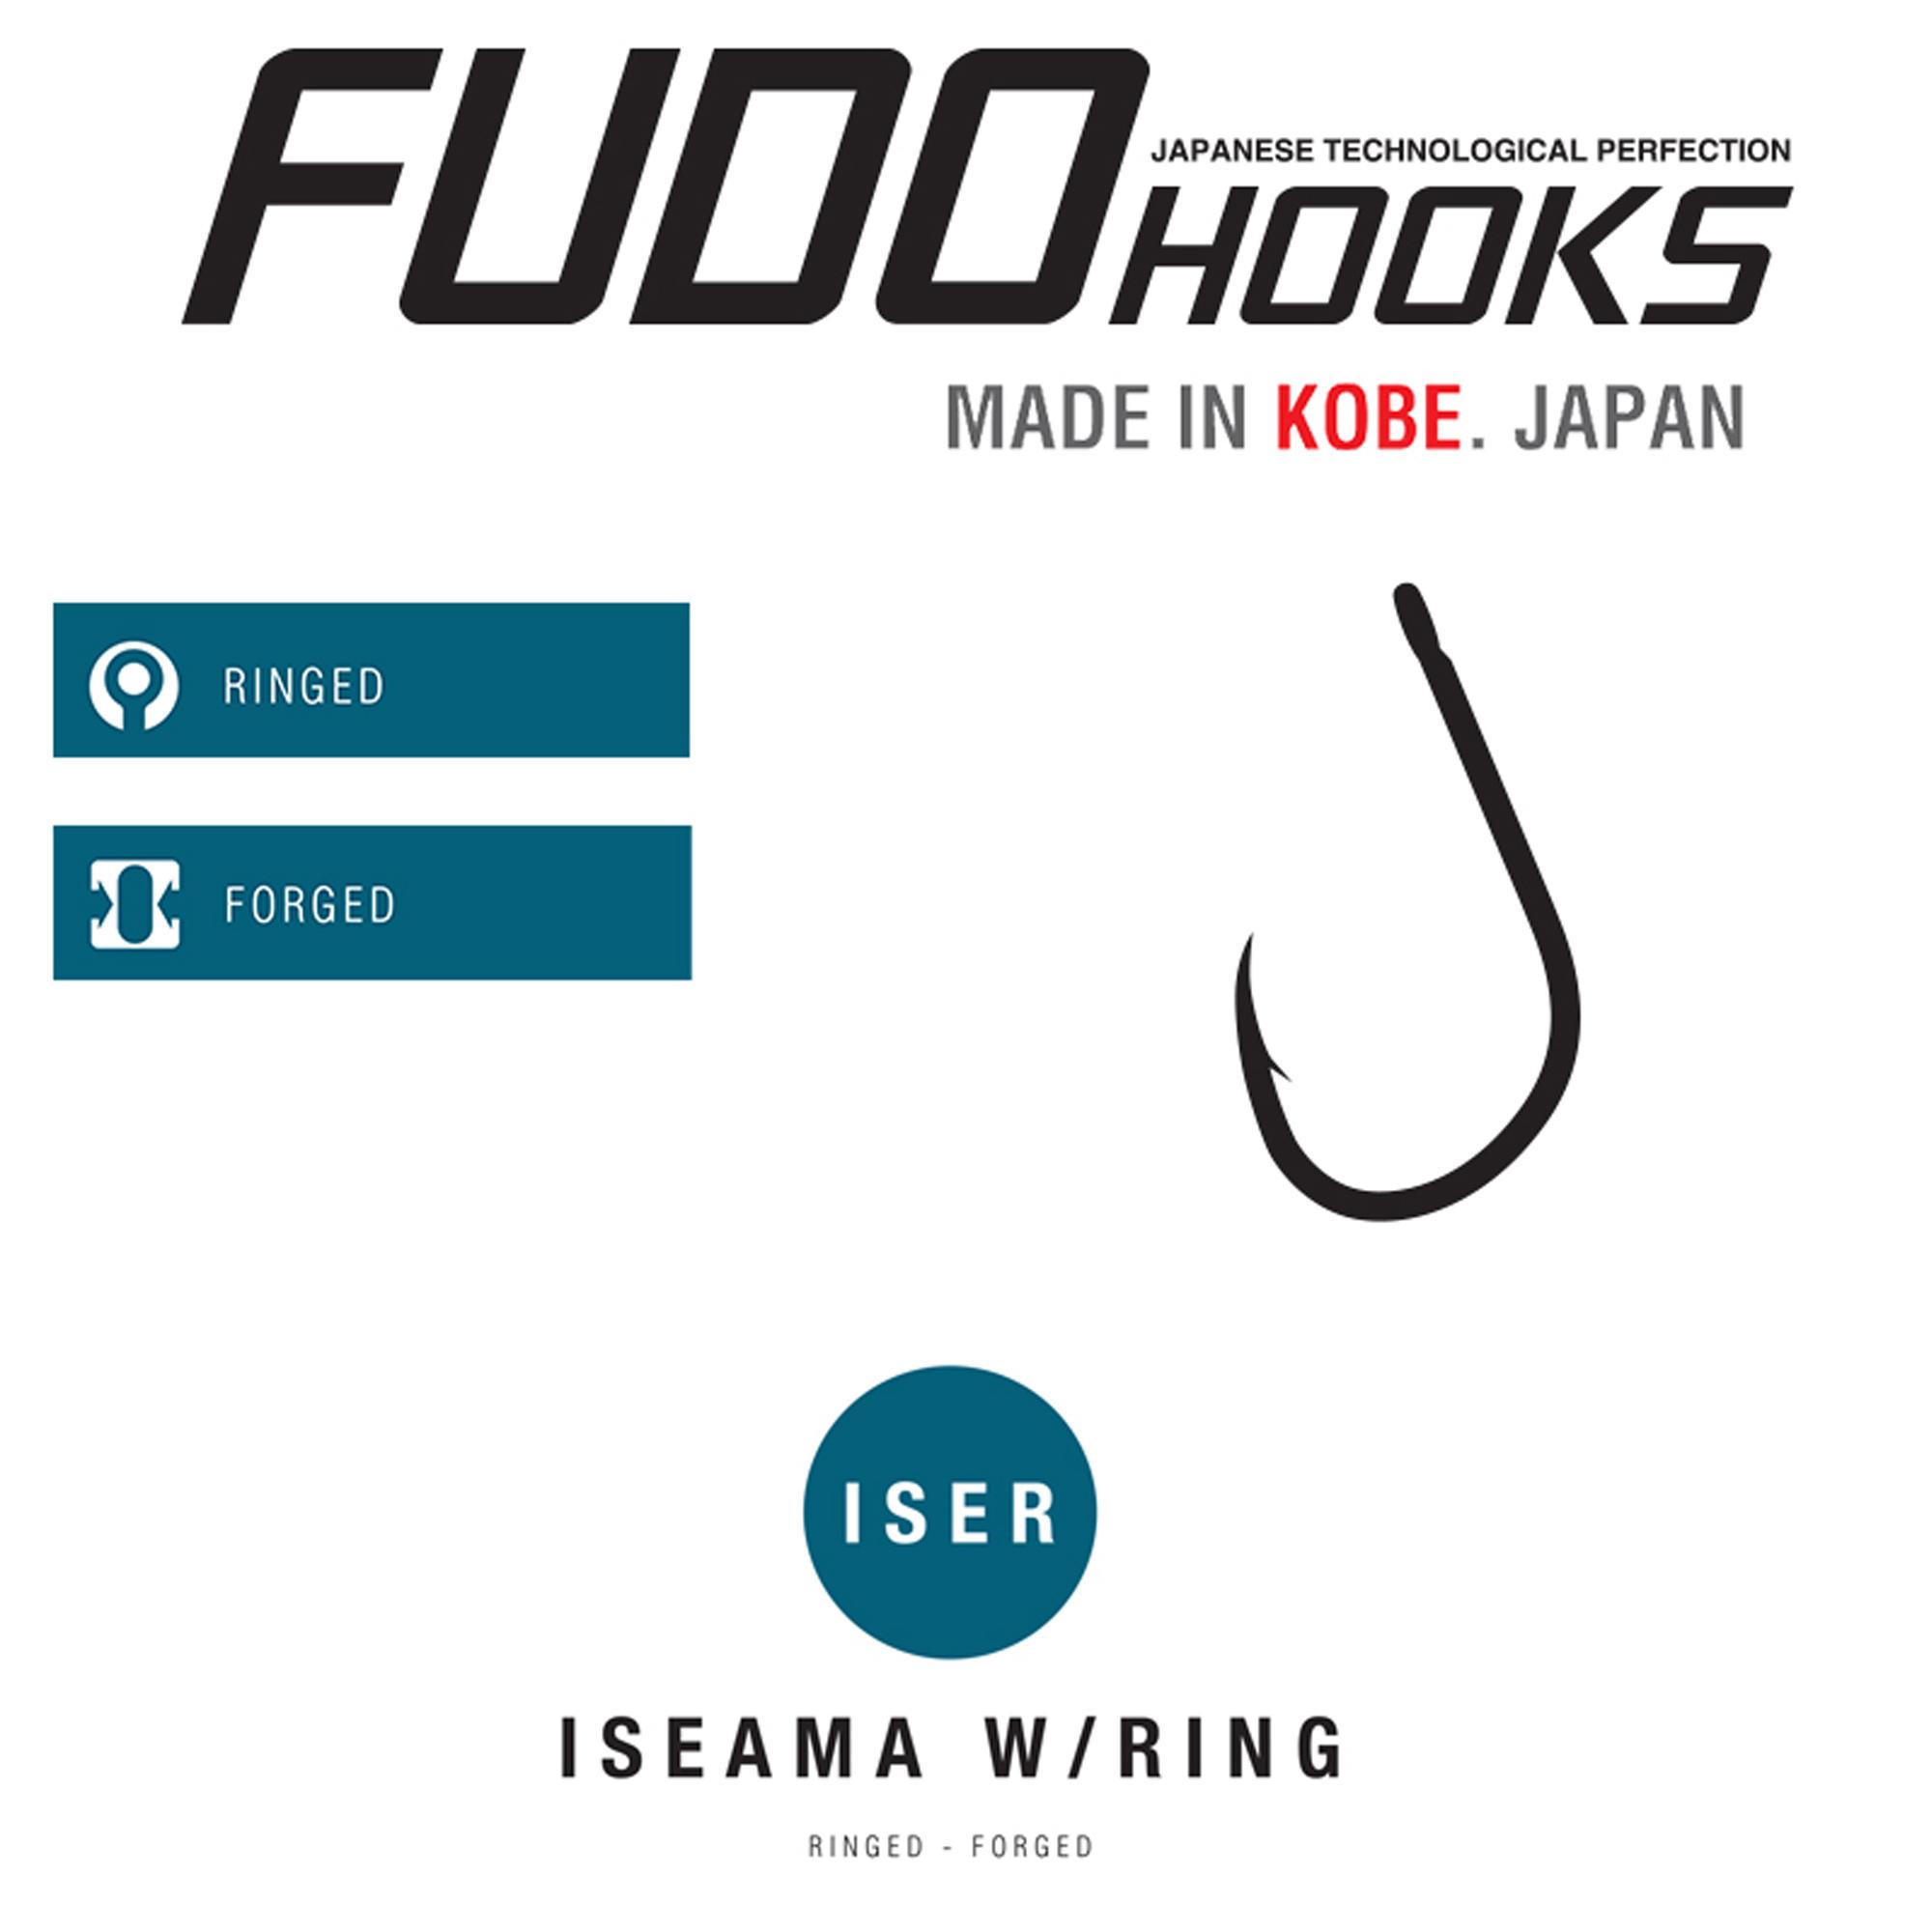 FUDO ISER-3007 Teflon 3007 imagine